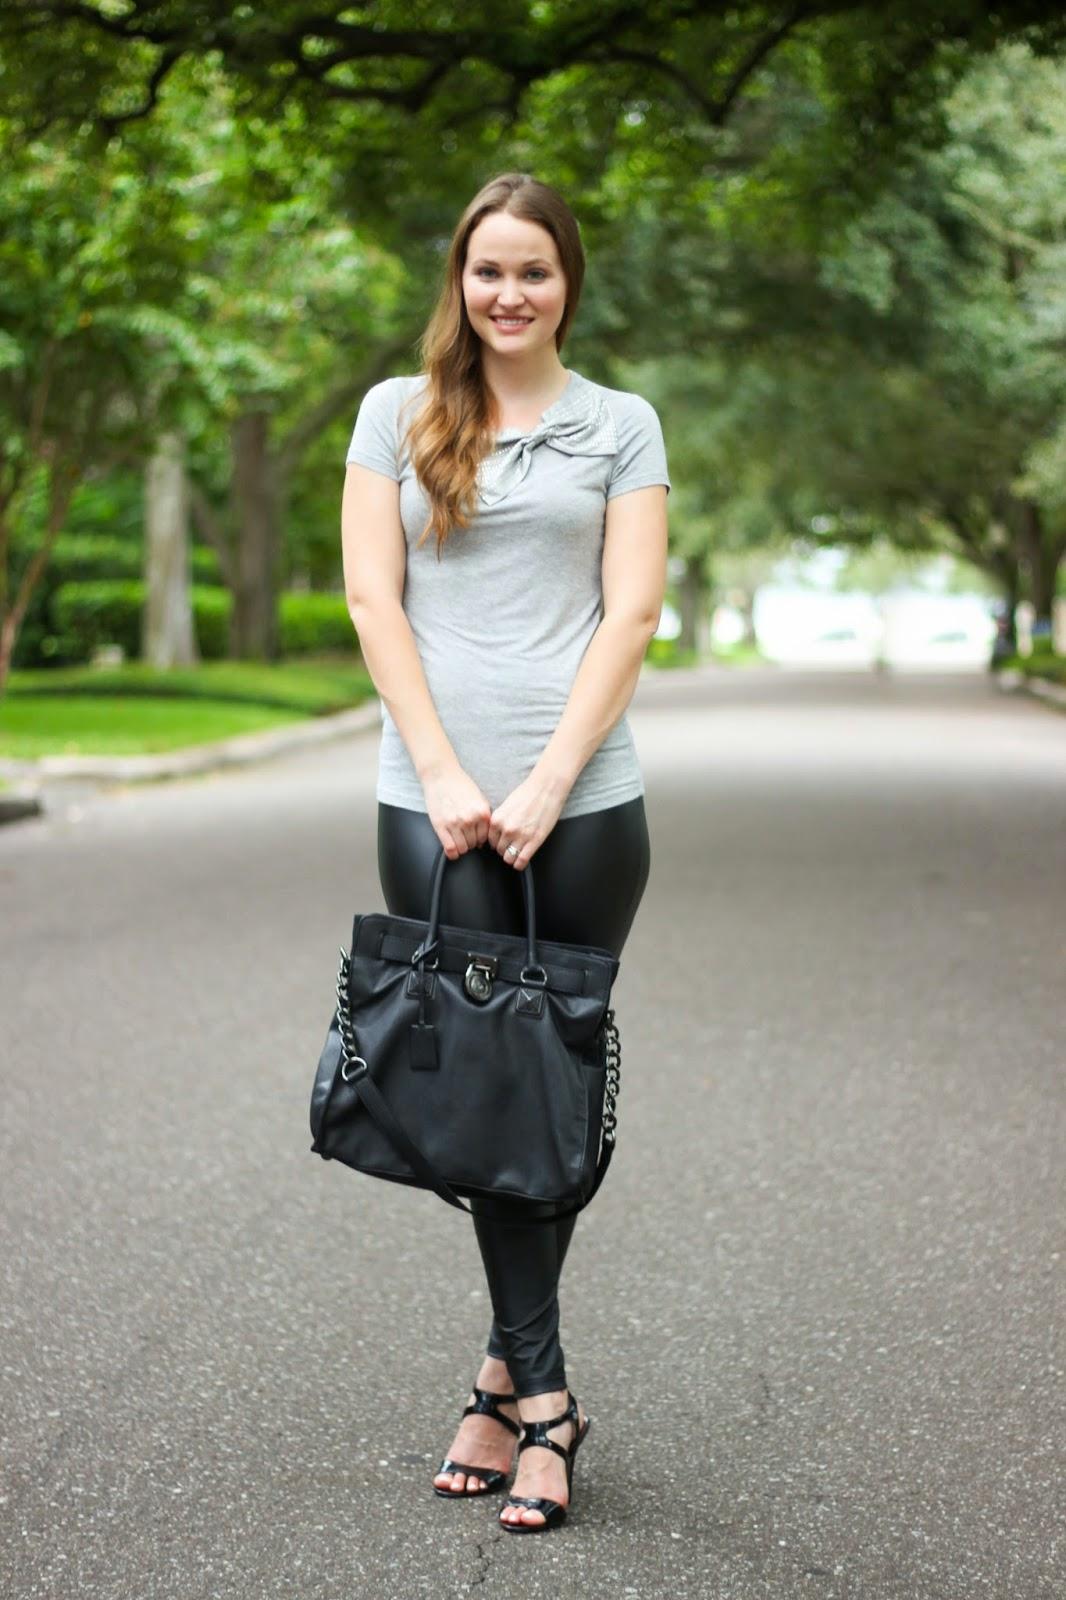 ede7b4ad858f29 (bow tee: Forever 21; faux leather leggings: Hue; bag: Hamilton by Michael  Kors; black patent heels: Steve Madden)